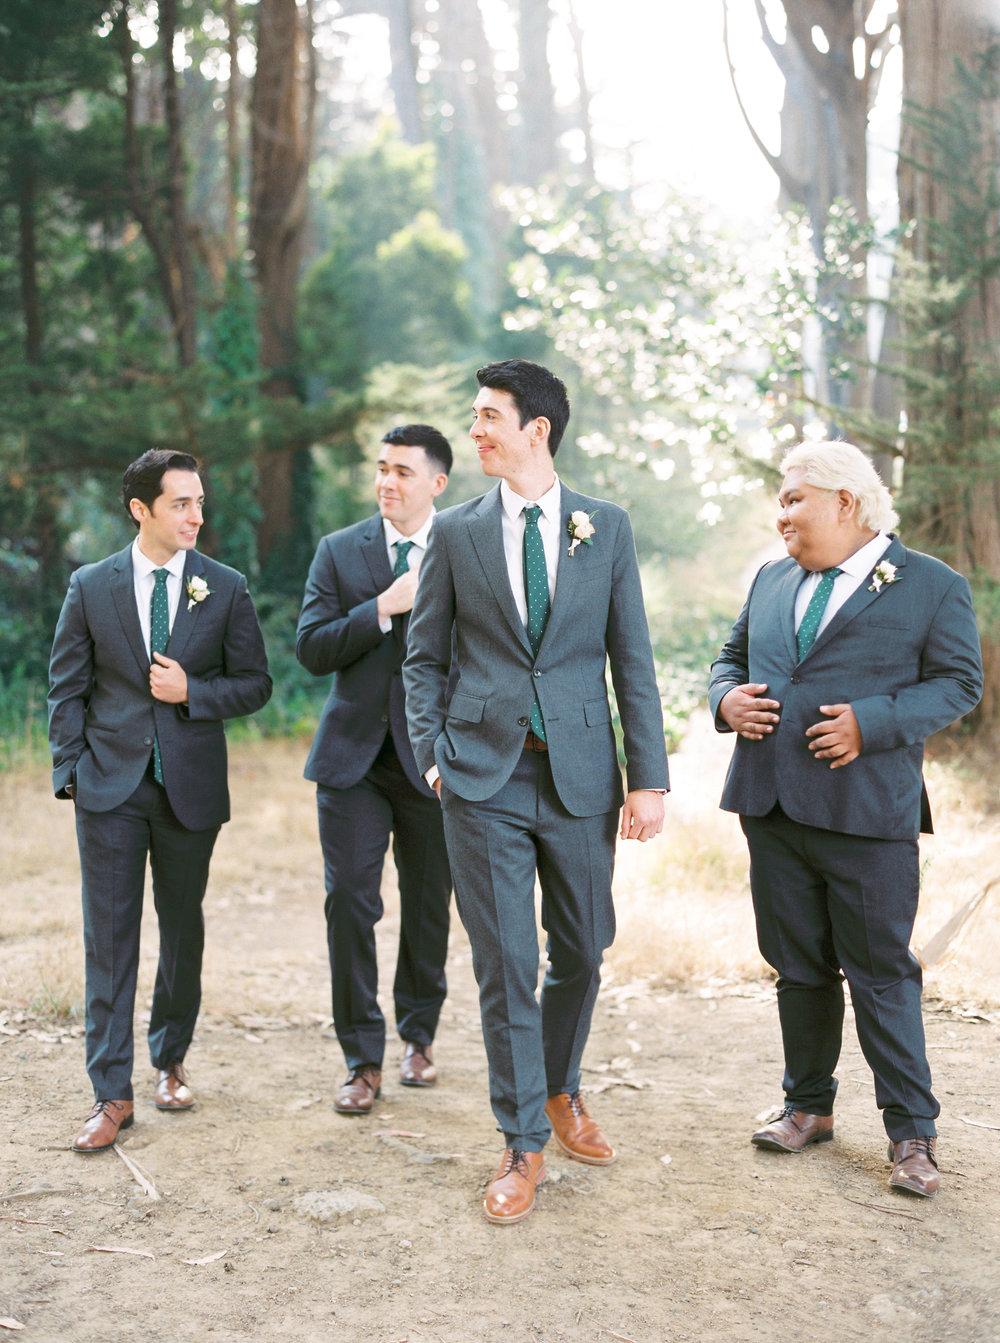 Log-cabin-wedding-in-presidio-san-francisco-california-desintation-wedding-photography-70.jpg